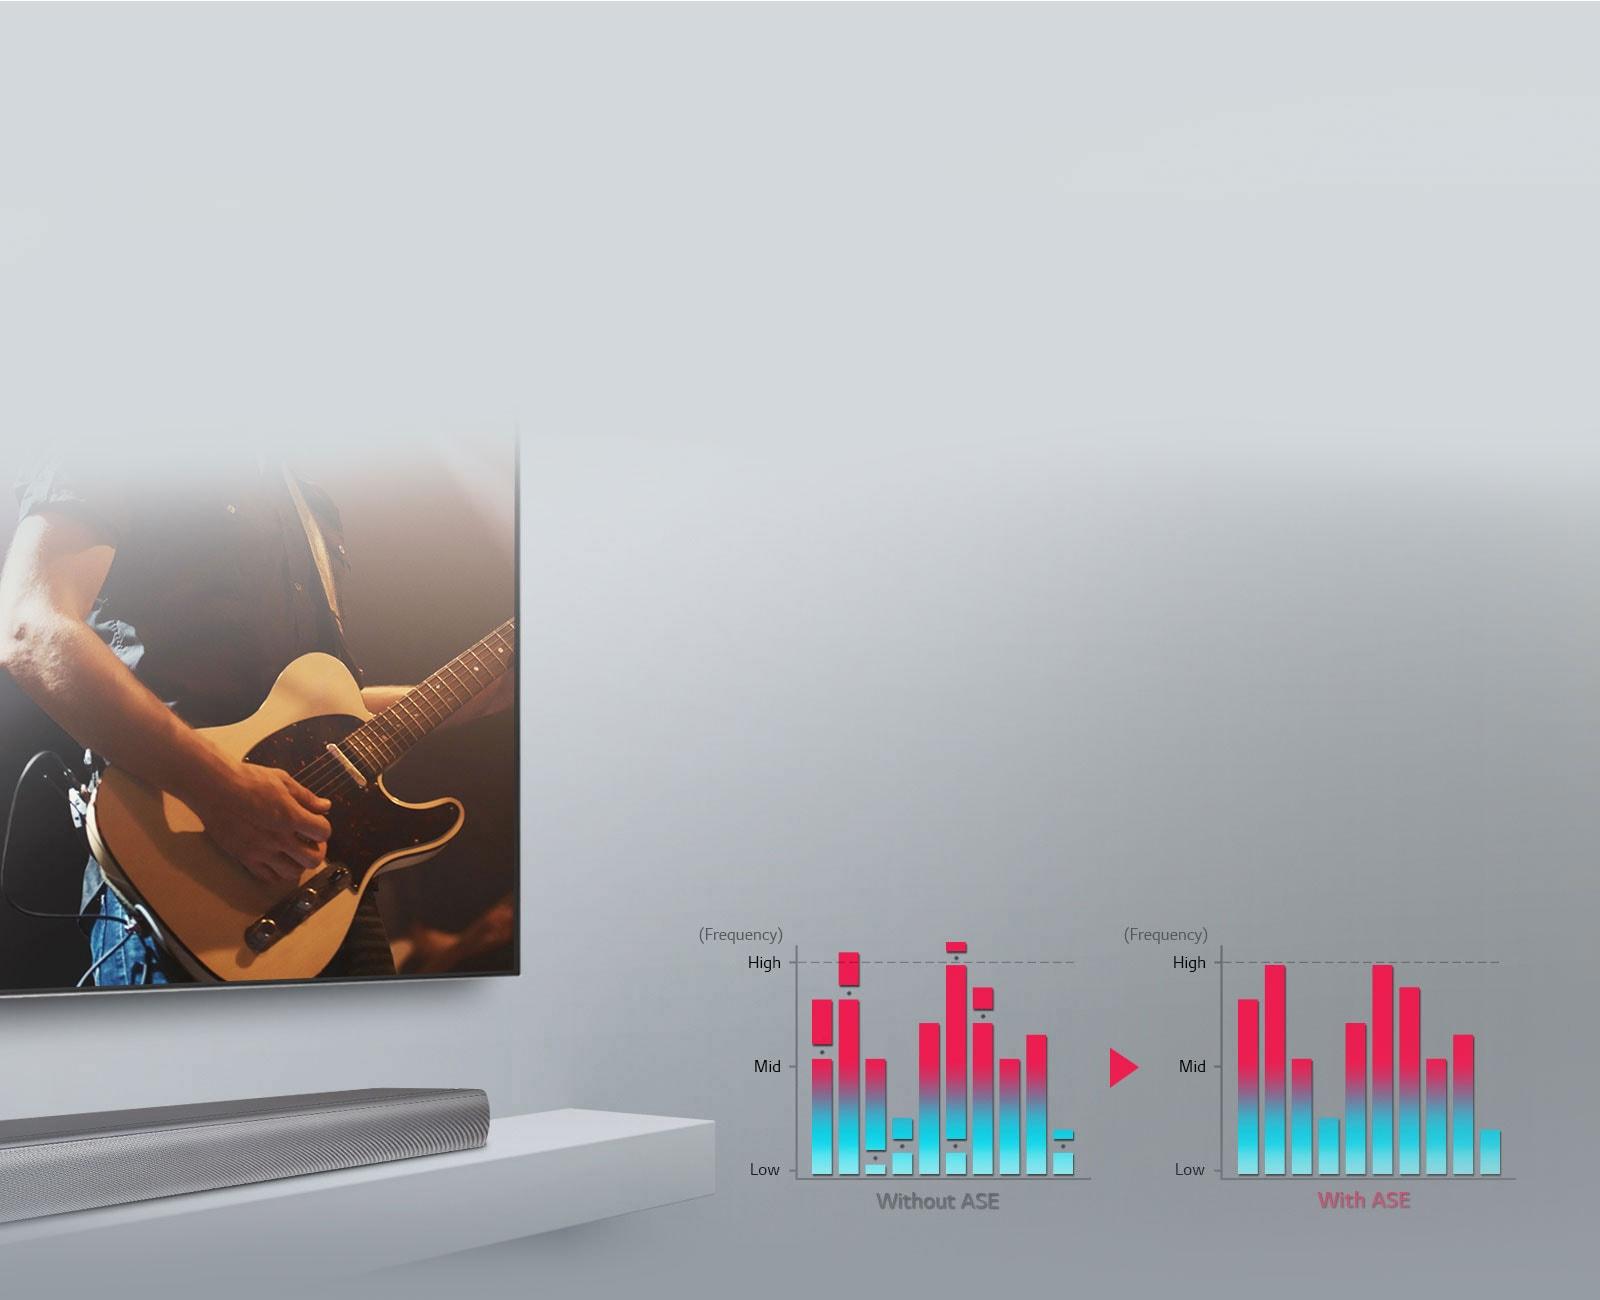 Auto Sound Engine, sound balance at any volume